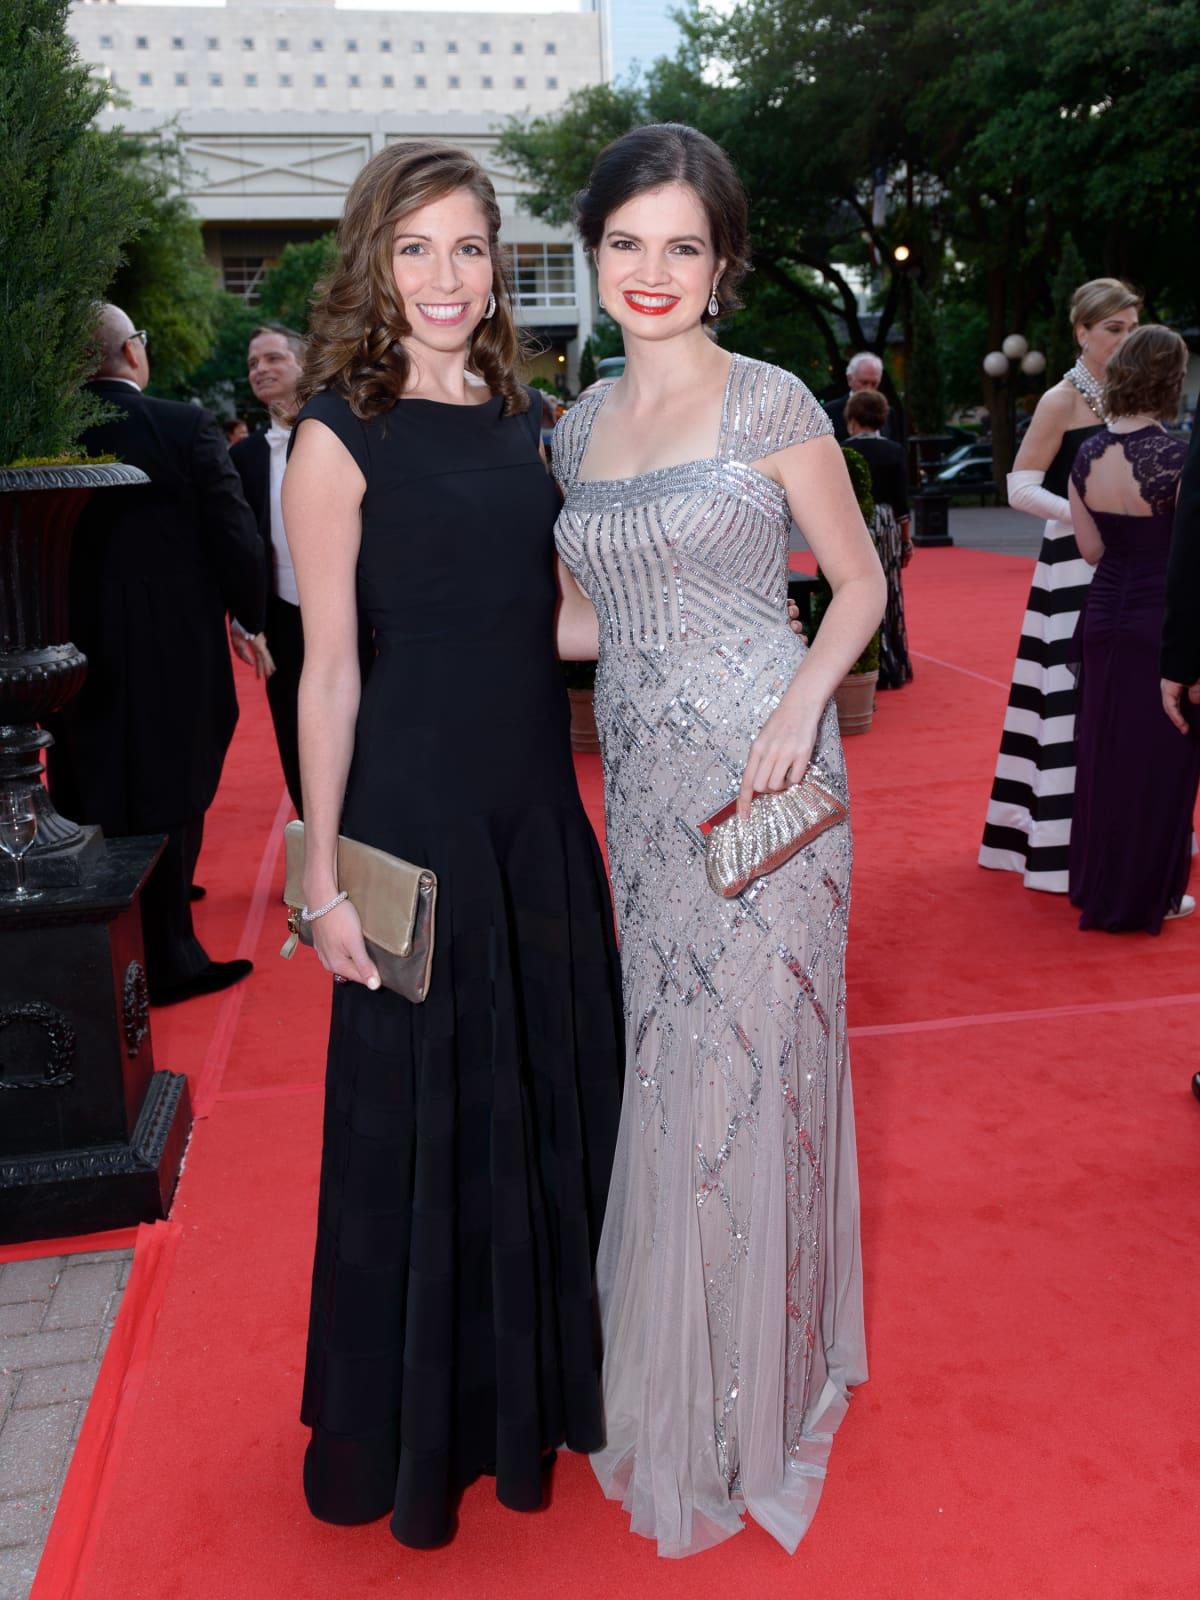 Houston Grand Opera Ball, April 2016 Allison Savire, Sarah Dunagin